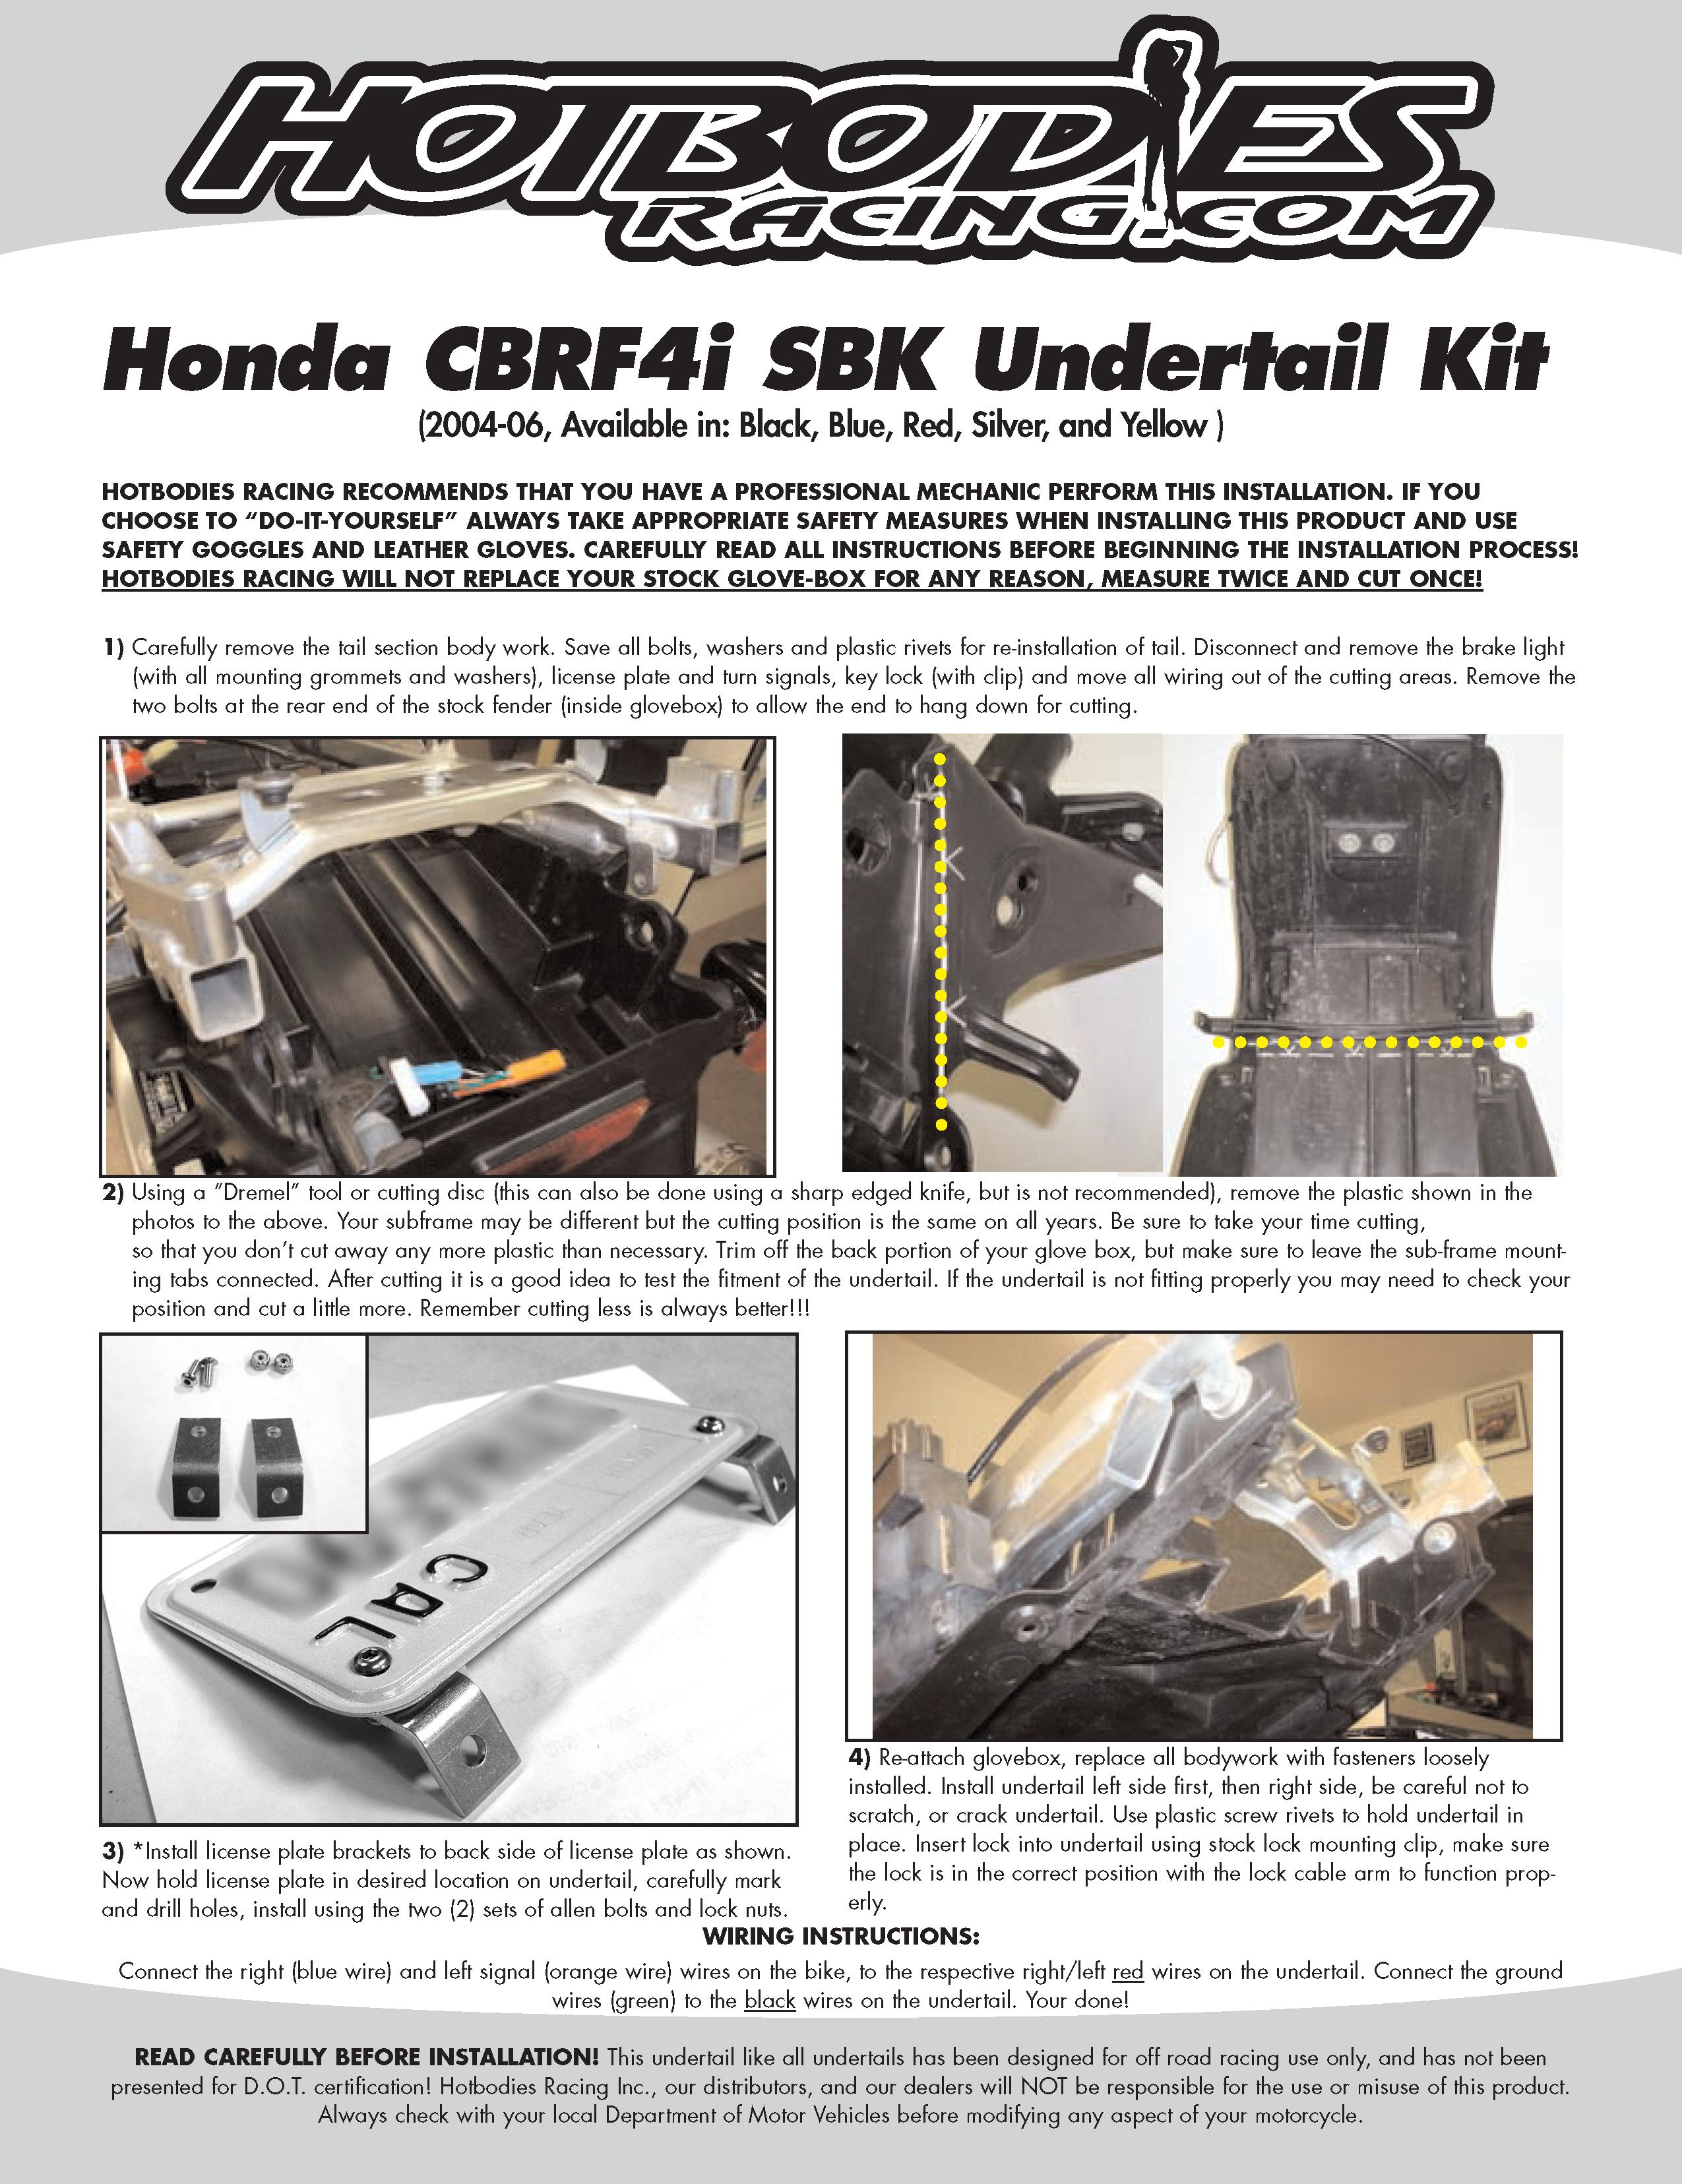 Honda Cbr F4i 2004 06 Installation Yamaha 600 2011 Wiring Diagram Undertail